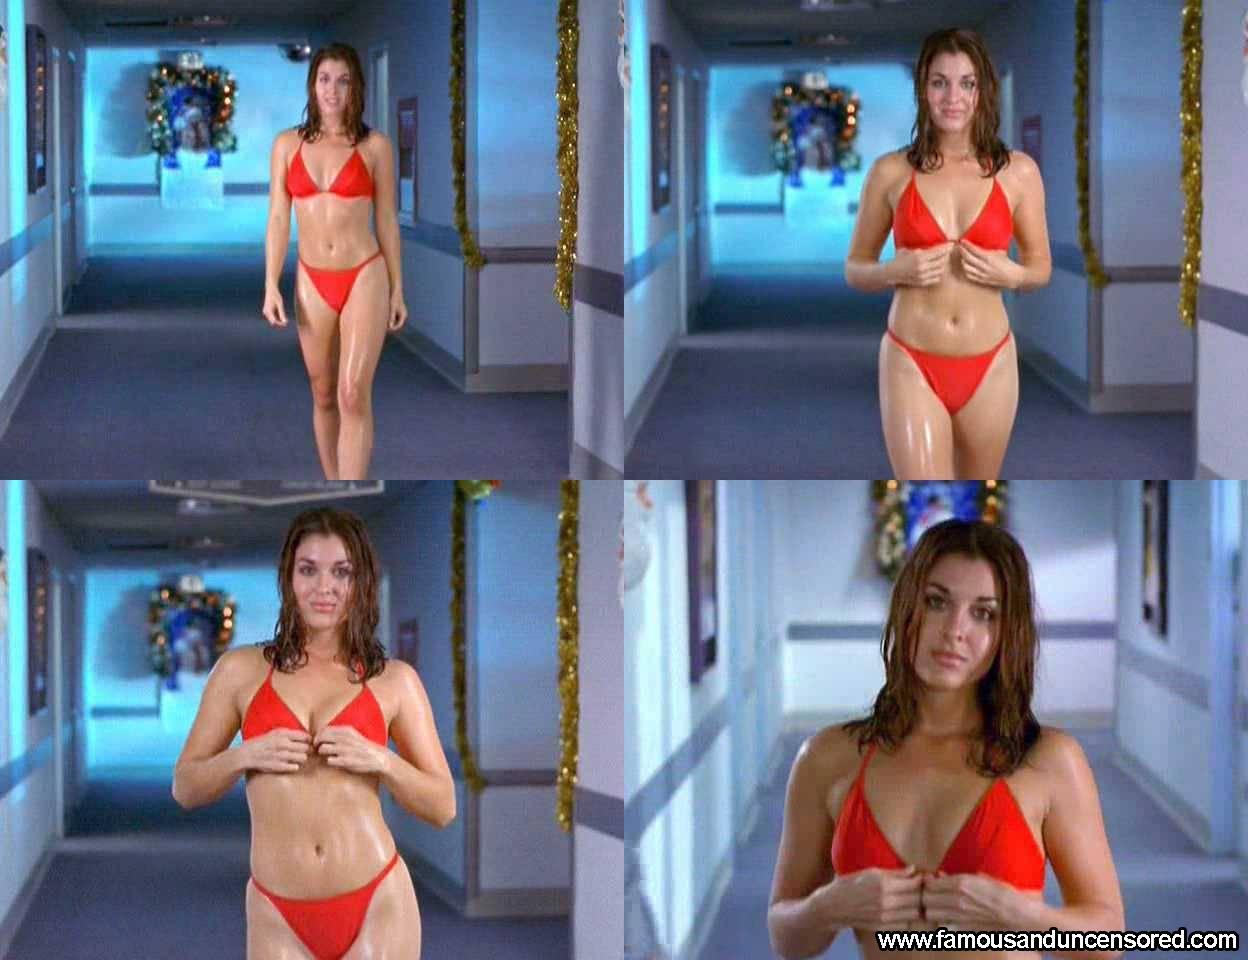 Monica allgeier nude